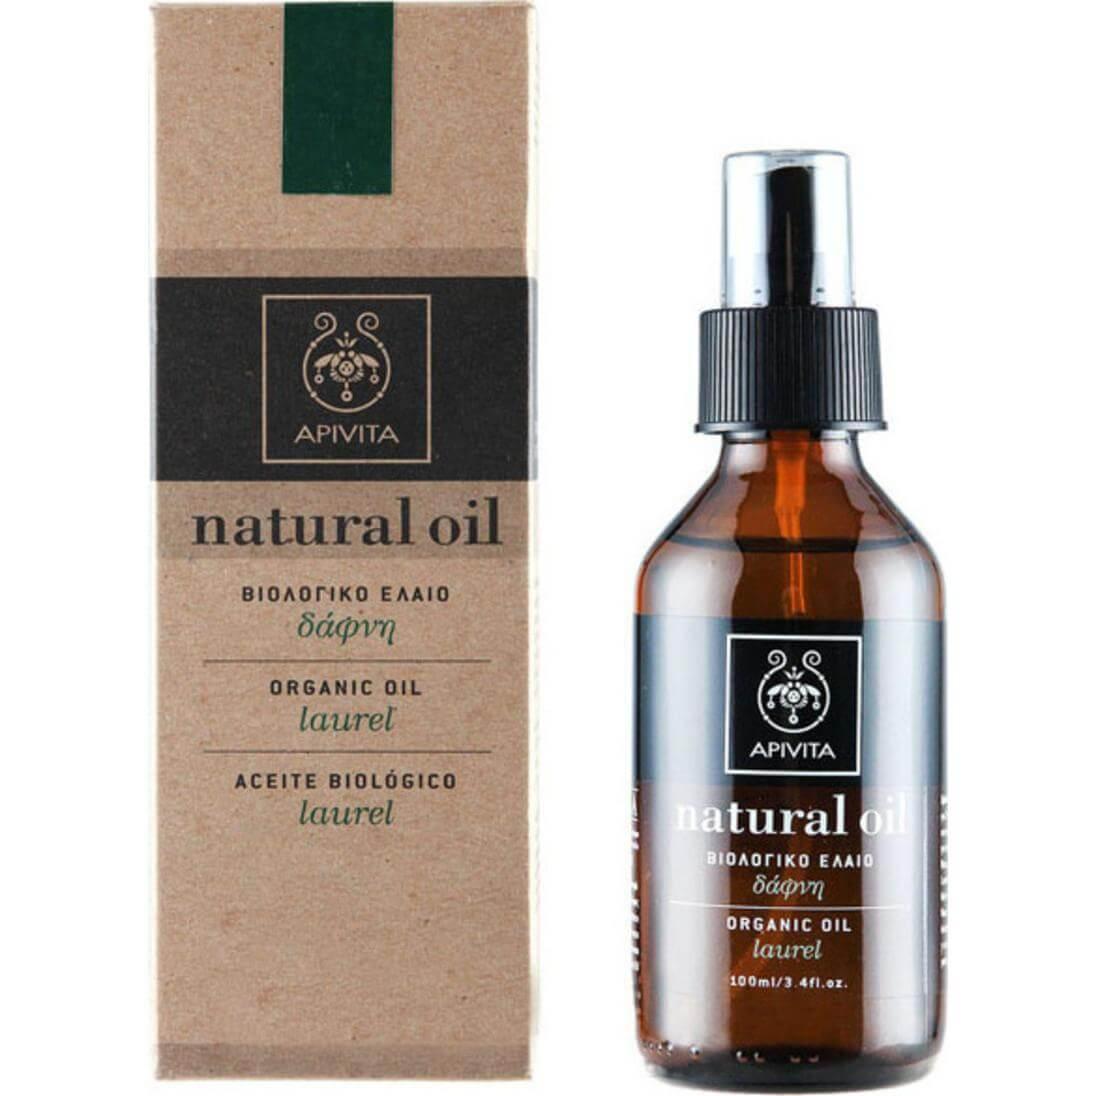 Apivita Natural Oil Βιολογικό Έλαιο Δάφνη 100ml